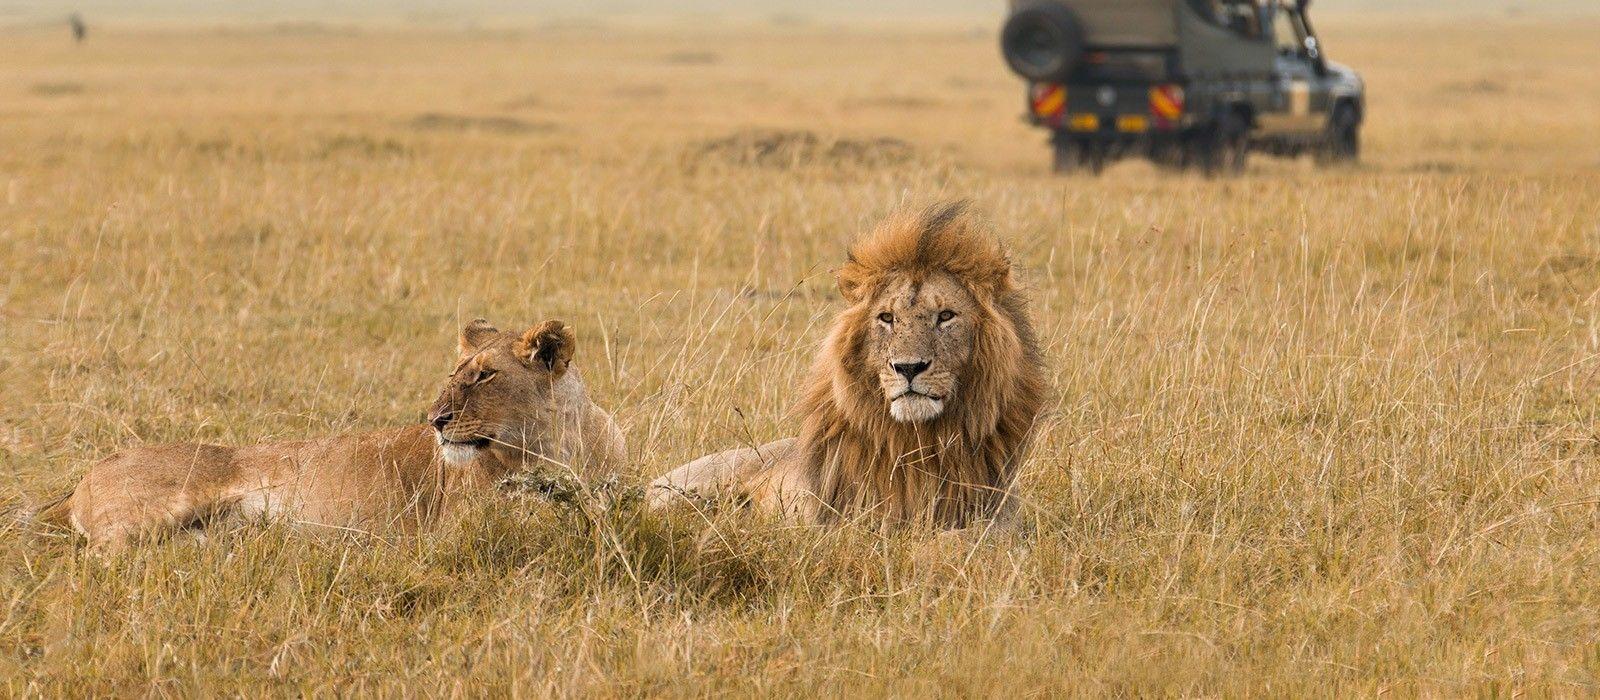 Kenia: Masai Mara, Wandersafaris & Traumstrände Urlaub 2